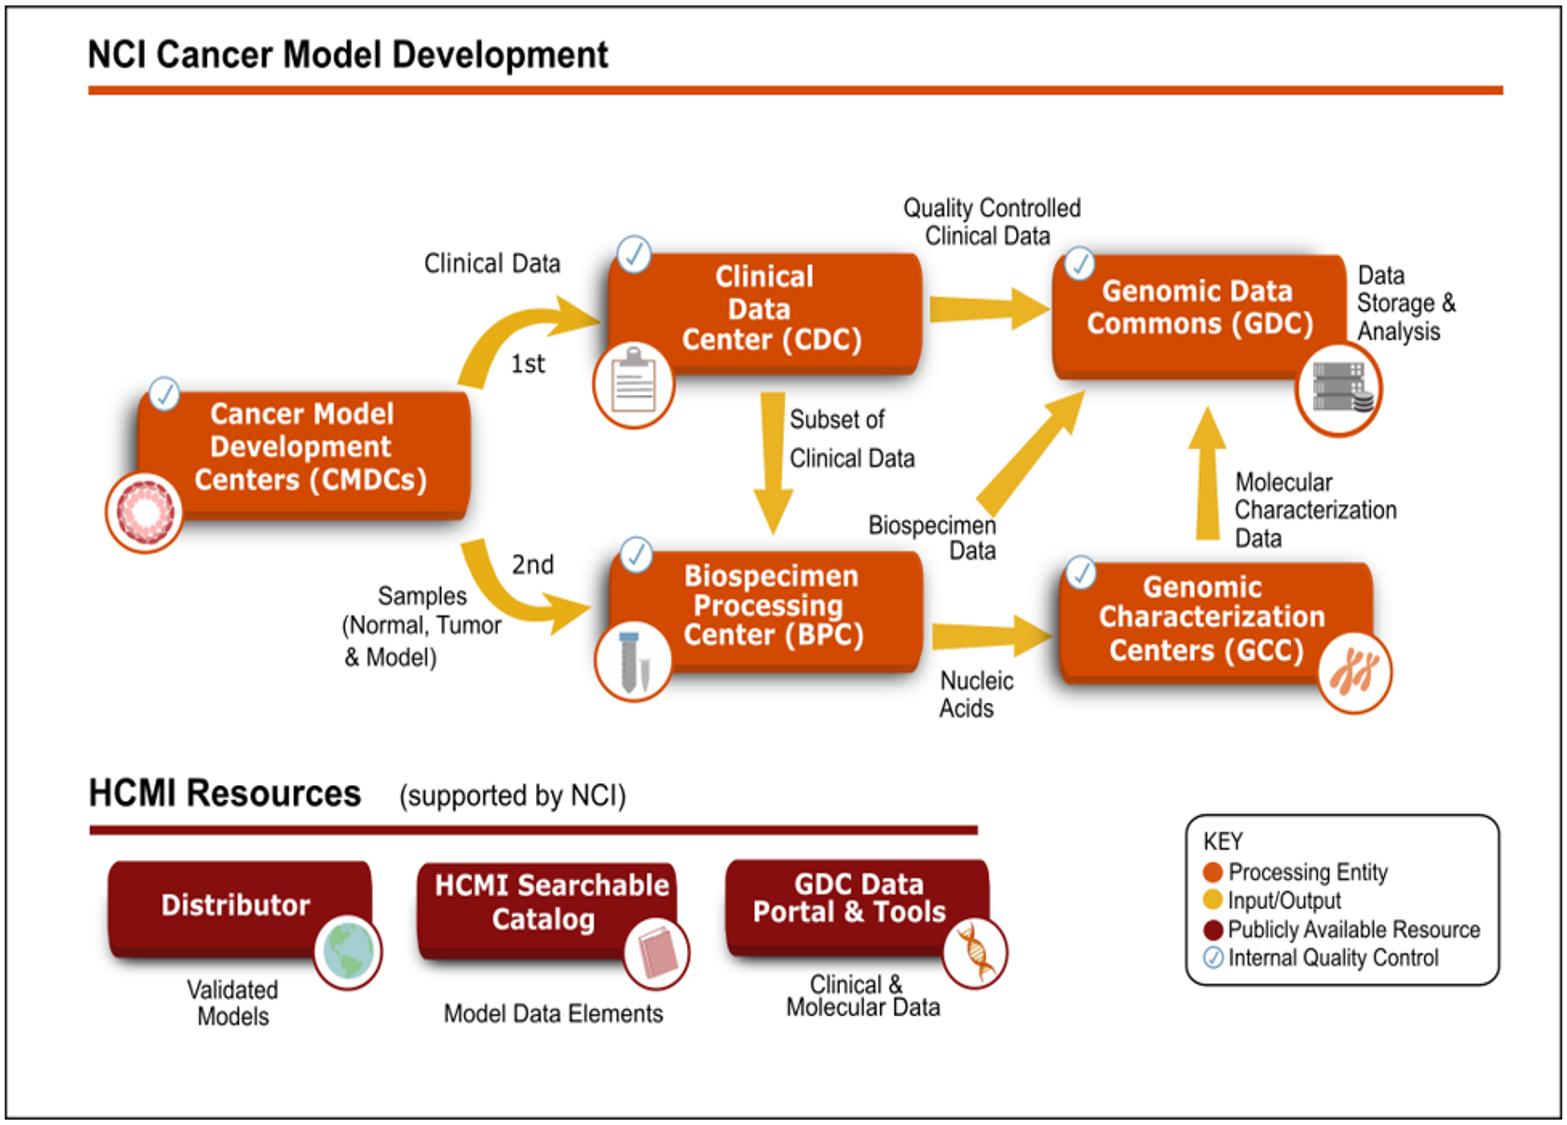 NCI Cancer Model Development Flowchart